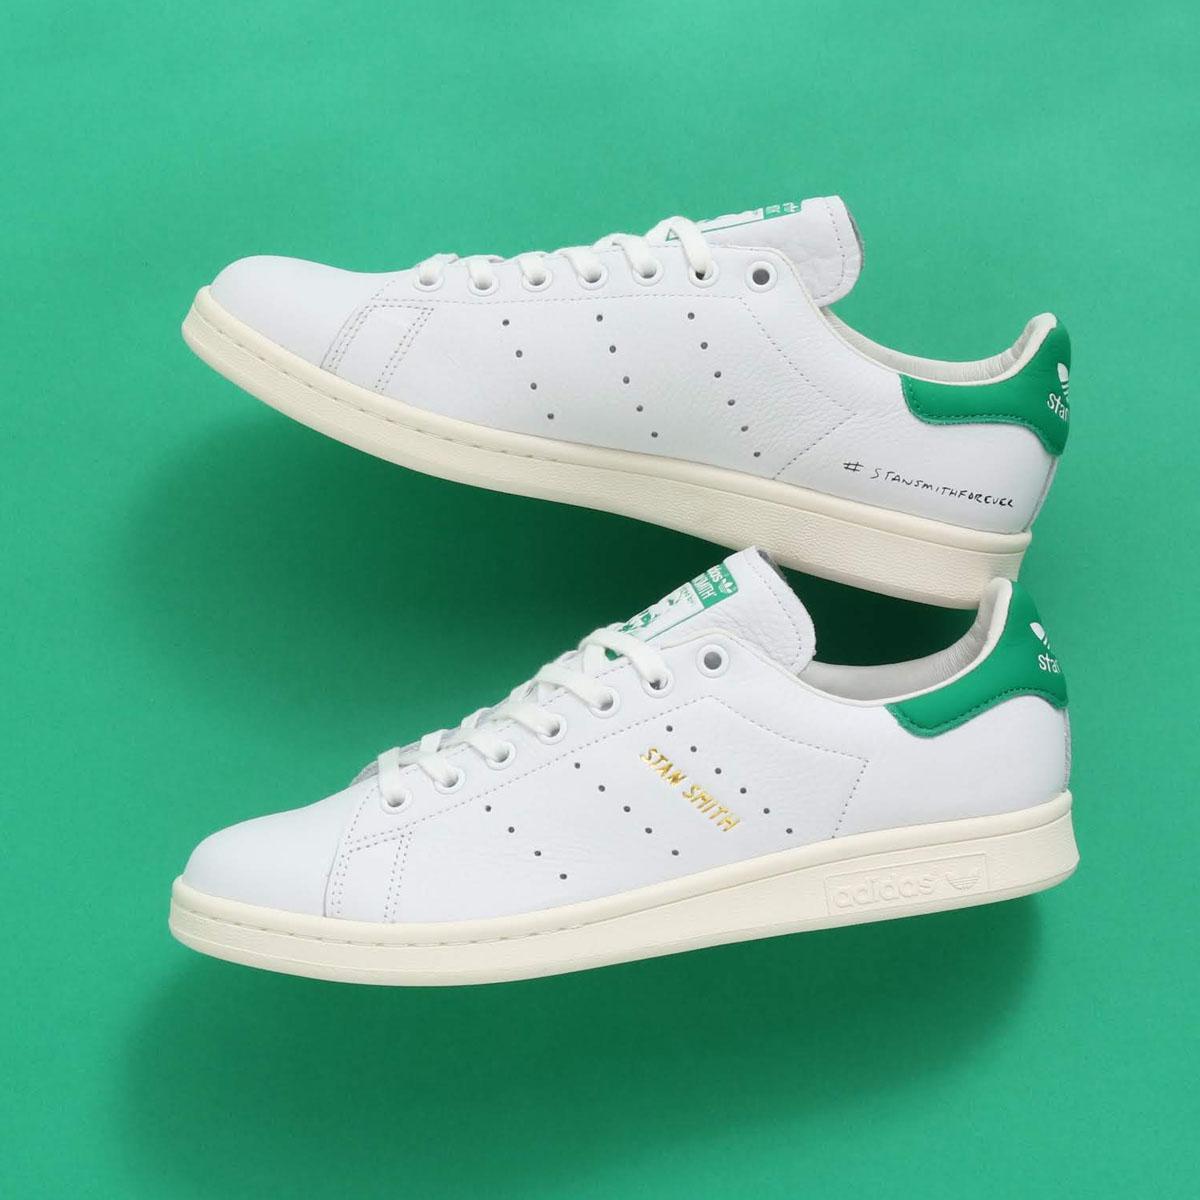 adidas Originals STAN SMITH FOREVER(アディダスオリジナルス スタンスミス)RUNNING WHITE/RUNNING WHITE/GREEN【メンズ レディース スニーカー】19SS-S